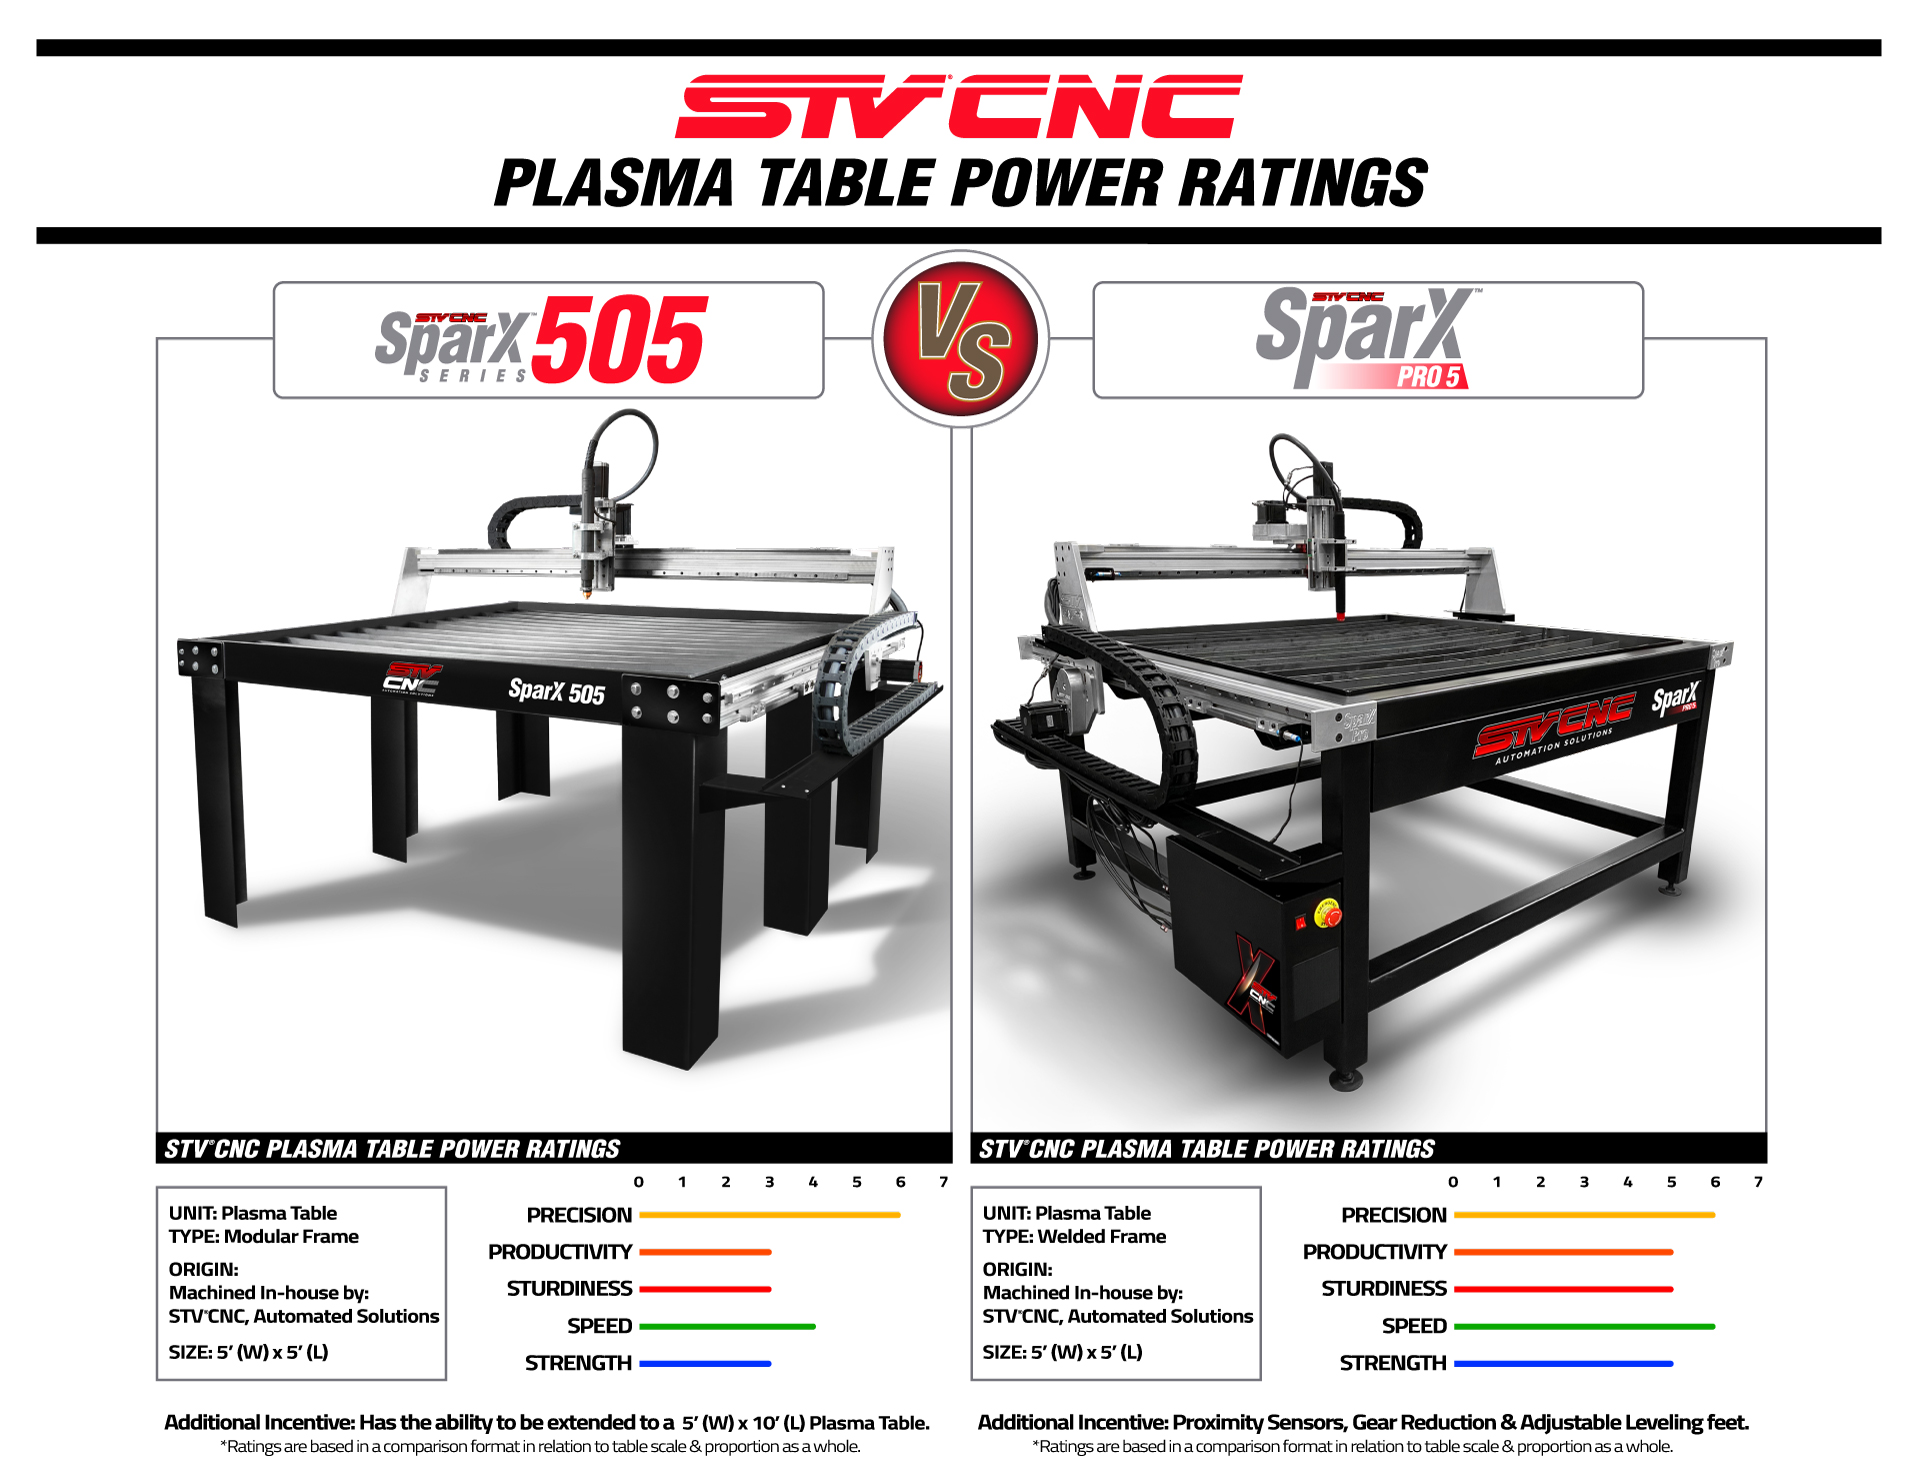 STVCNC Plasma Table Power Ratings 5x5